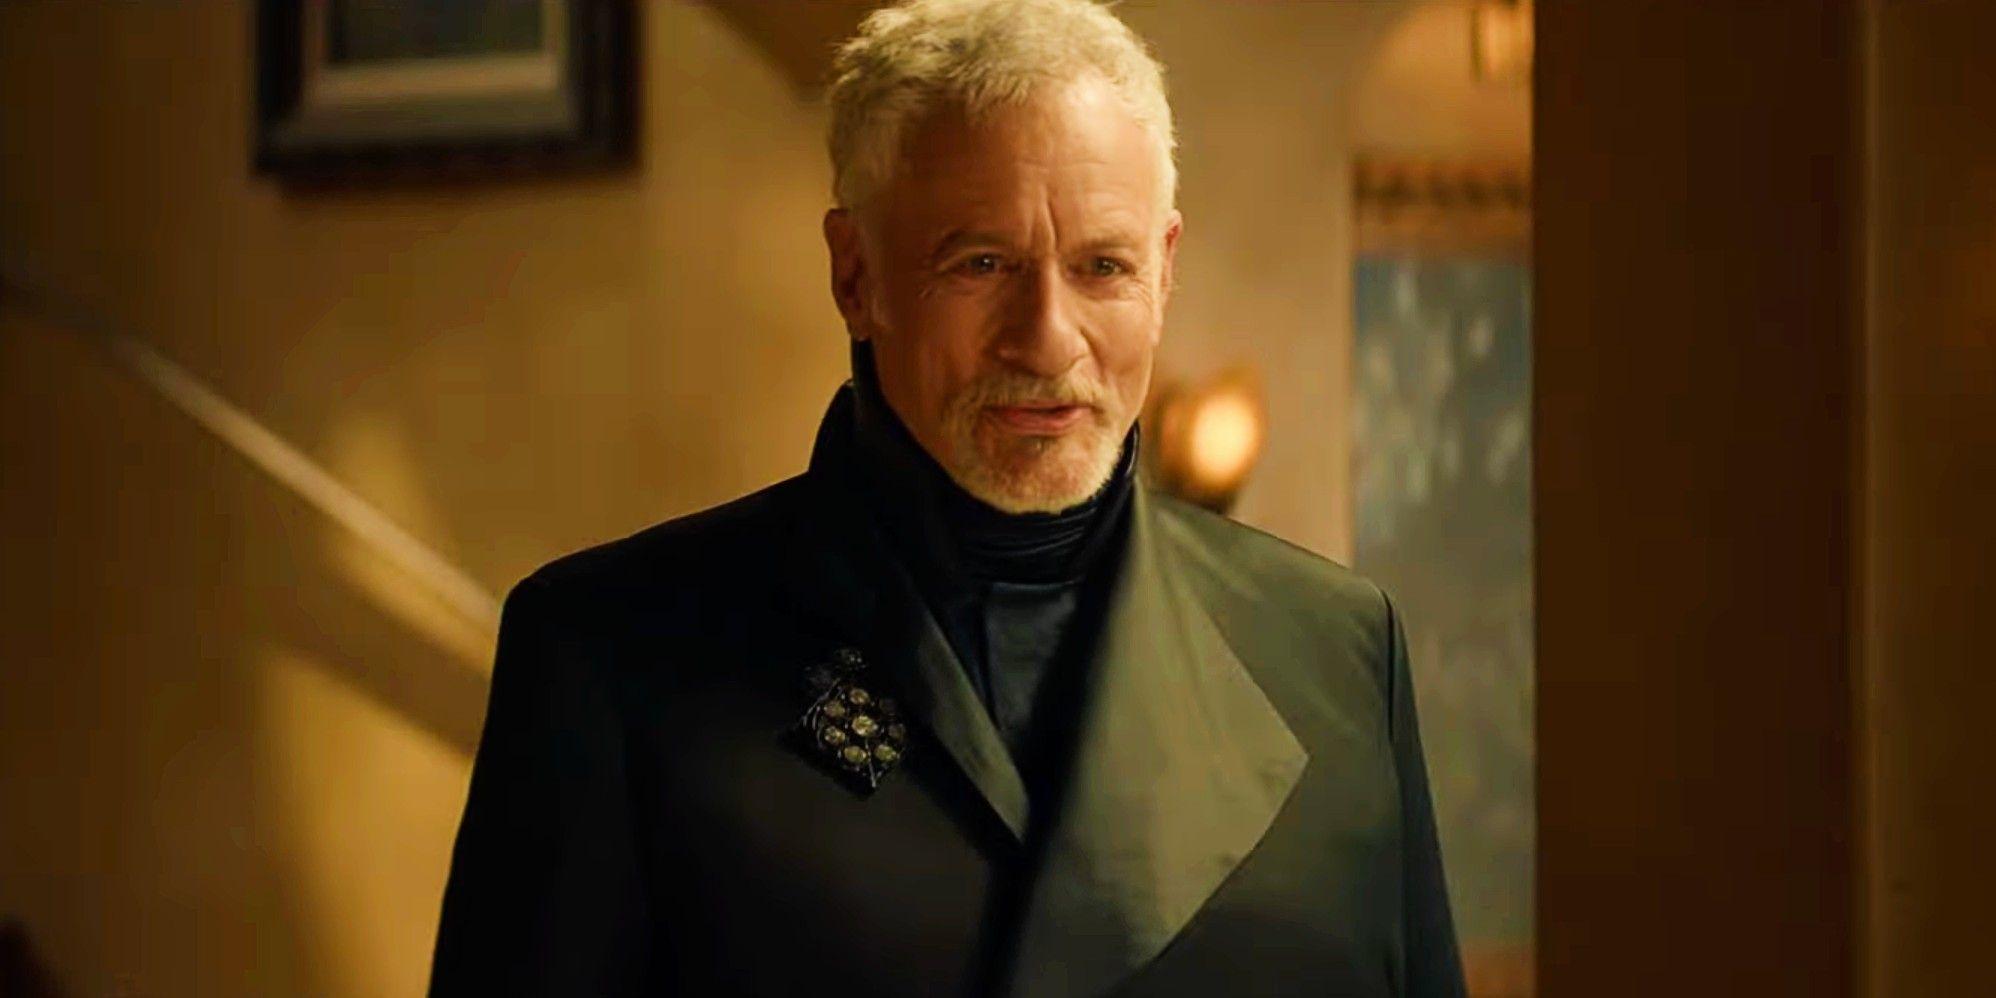 Star Trek's John de Lancie Teases Very Different Q In Picard Season 2